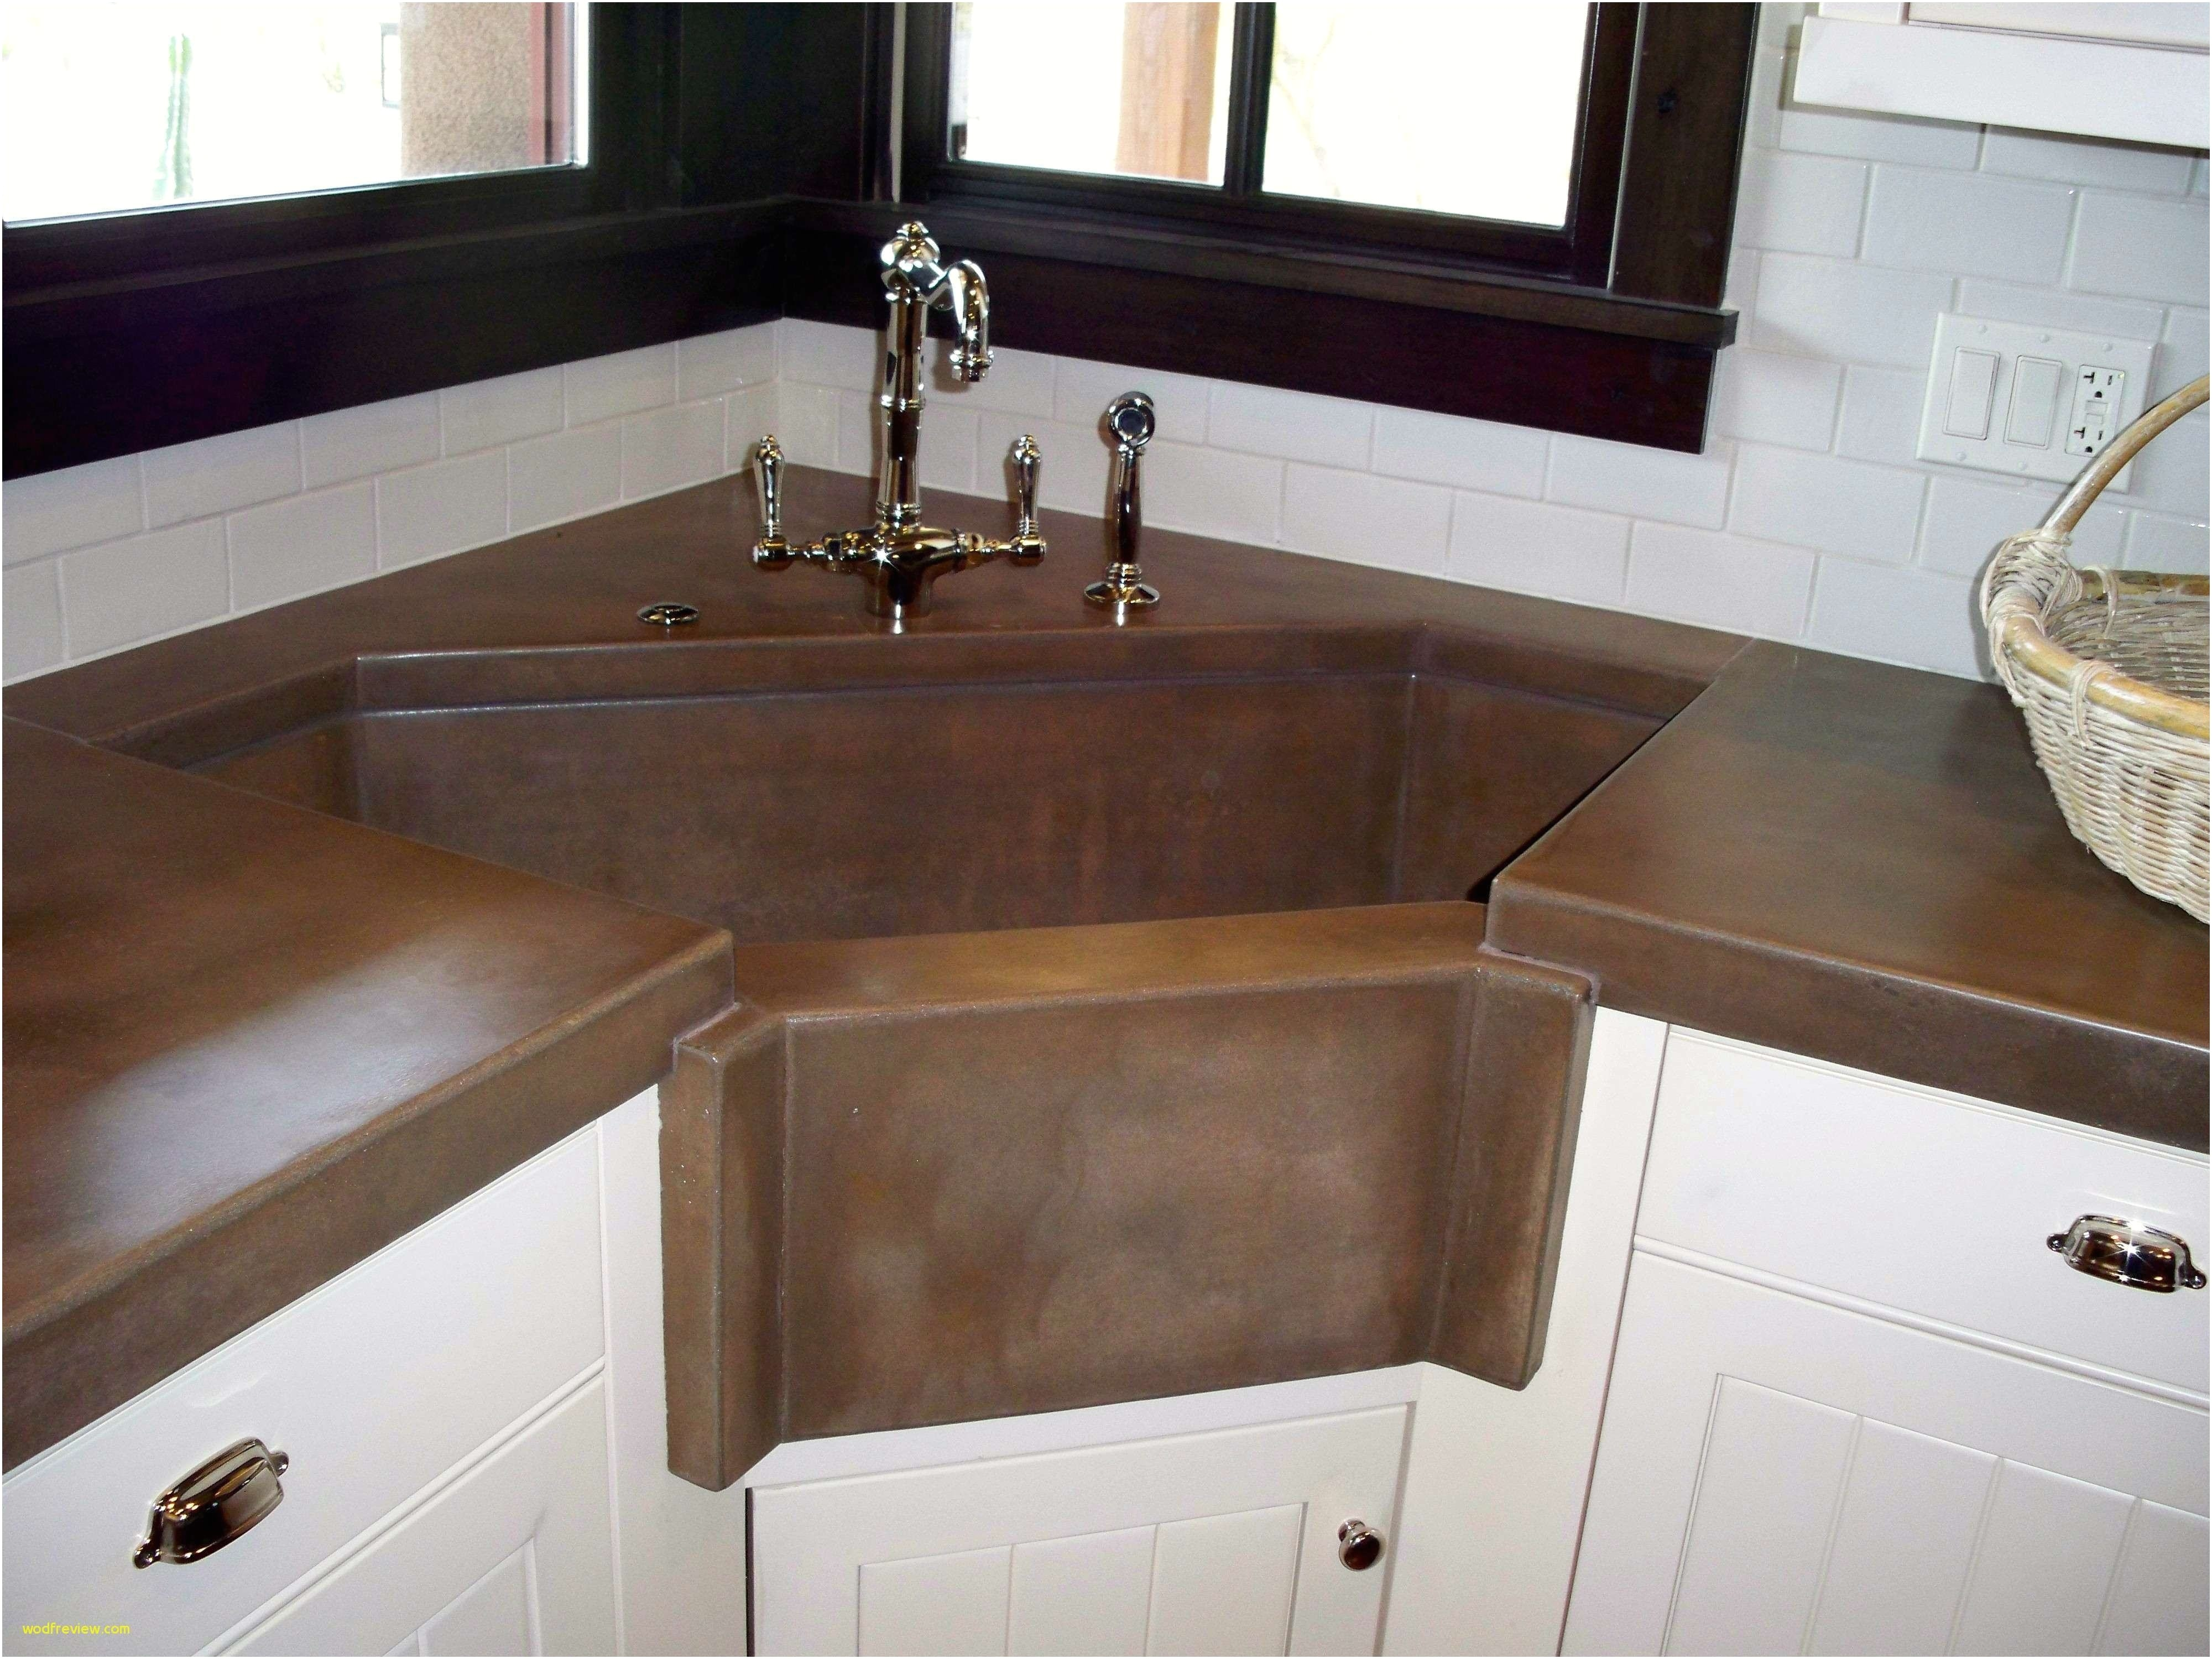 Kitchen Design for Small House Unique Kitchen Ideas Bathroom Elegant Ideas 0d Wodfreview Scheme